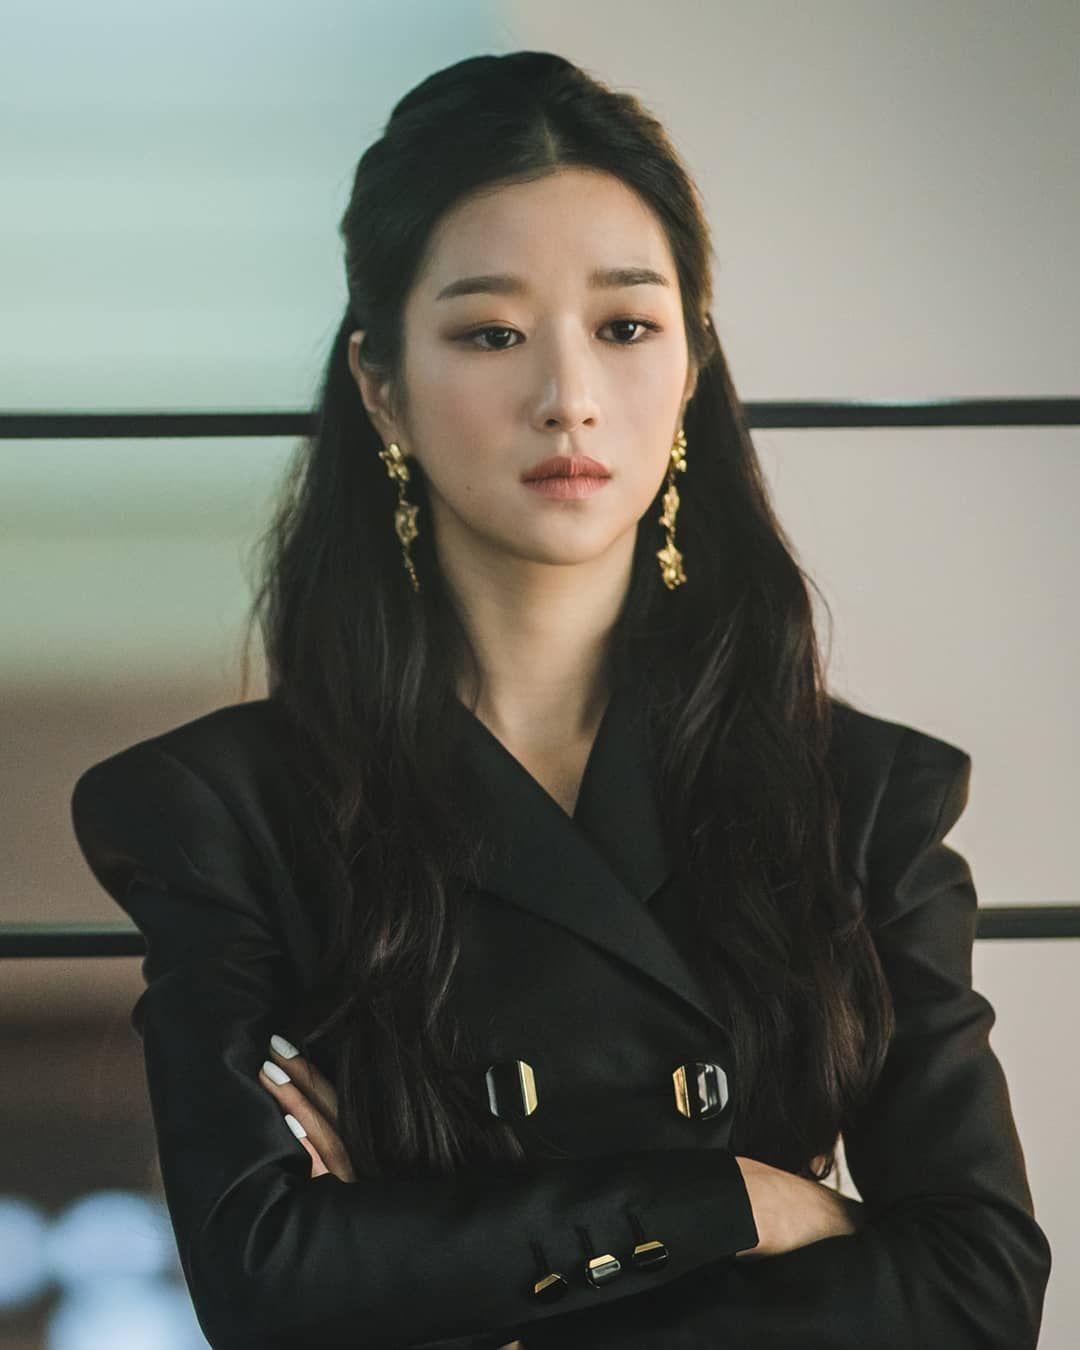 "Seo Ye-ji : ye-ji, Ye-ji, Fanpage, Instagram:, ""#SeoYeJi, #ItsOkaytoNotBeOkay, #KimSoohyun, #서예지, #사이코지만괜찮아, #무법변호사…, Fashion, Teenage, Girls,, Teenage,, Korean, Actresses"